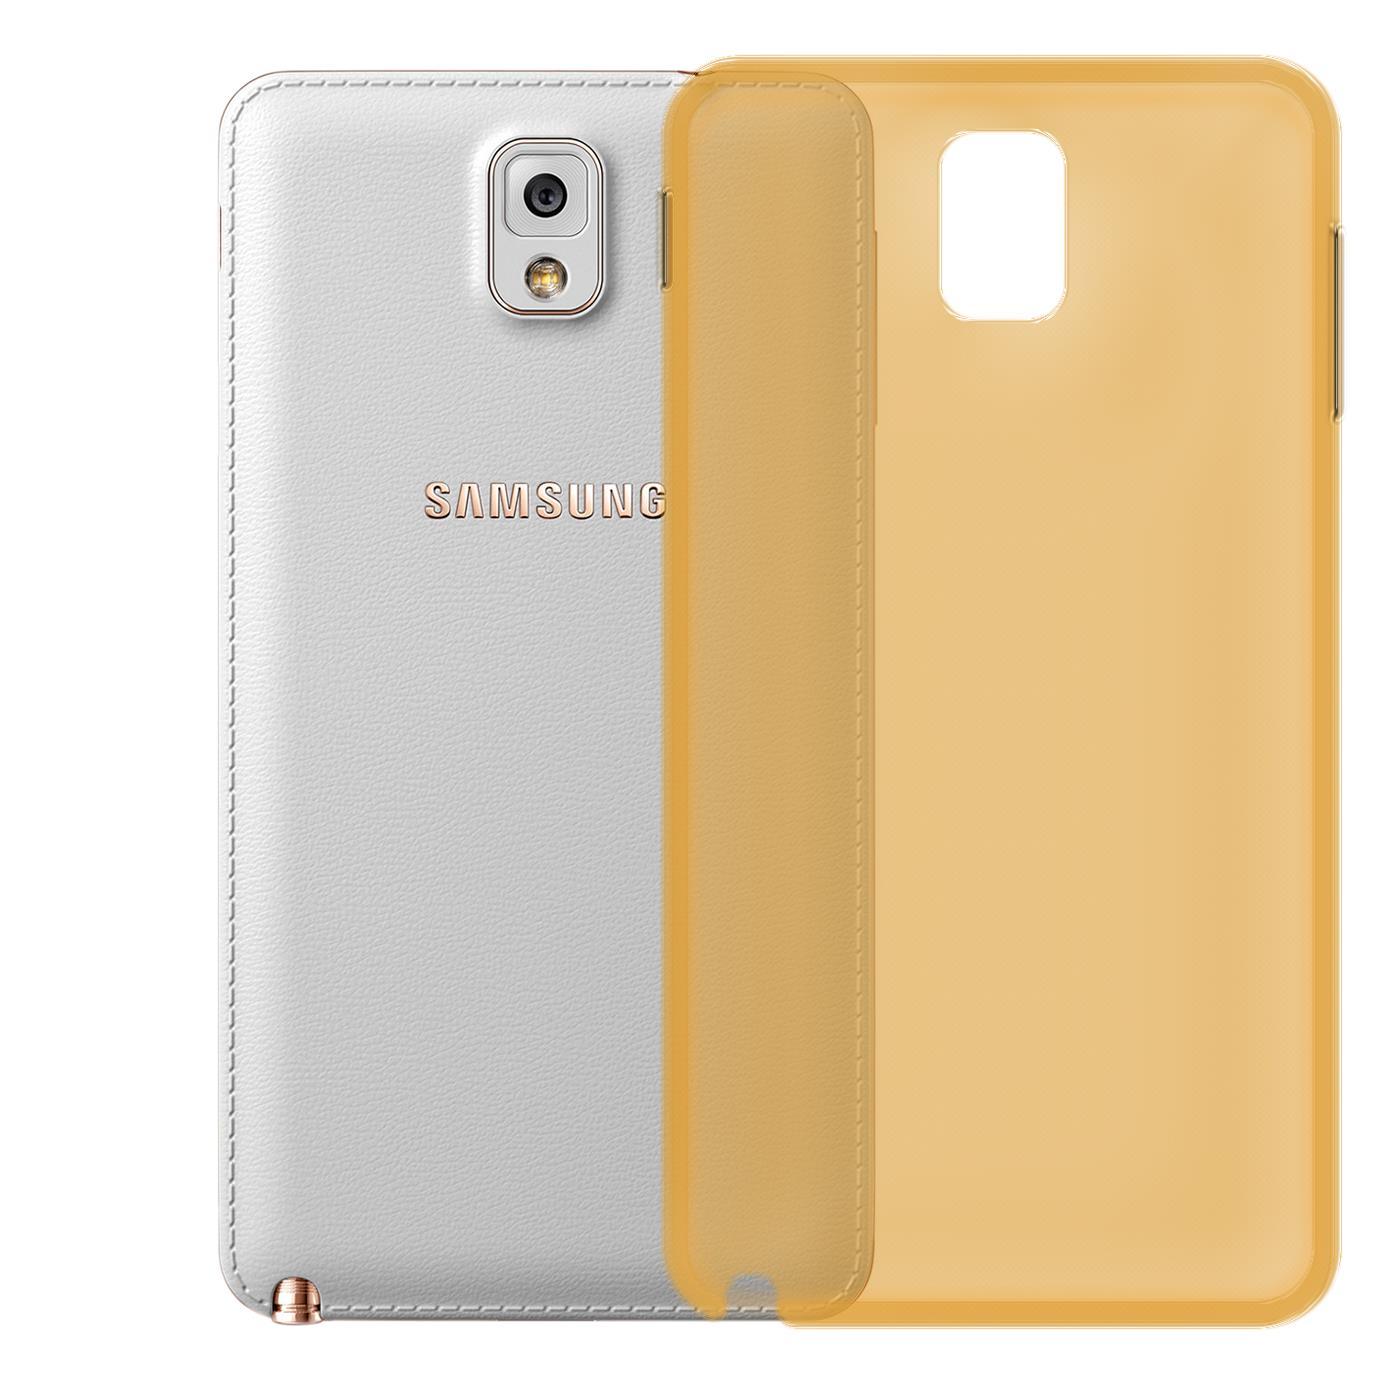 Samsung-Galaxy-Note-4-Thin-Silikon-Klar-Case-Cover-Ultra-Slim-Stossfeste-Gel Indexbild 16